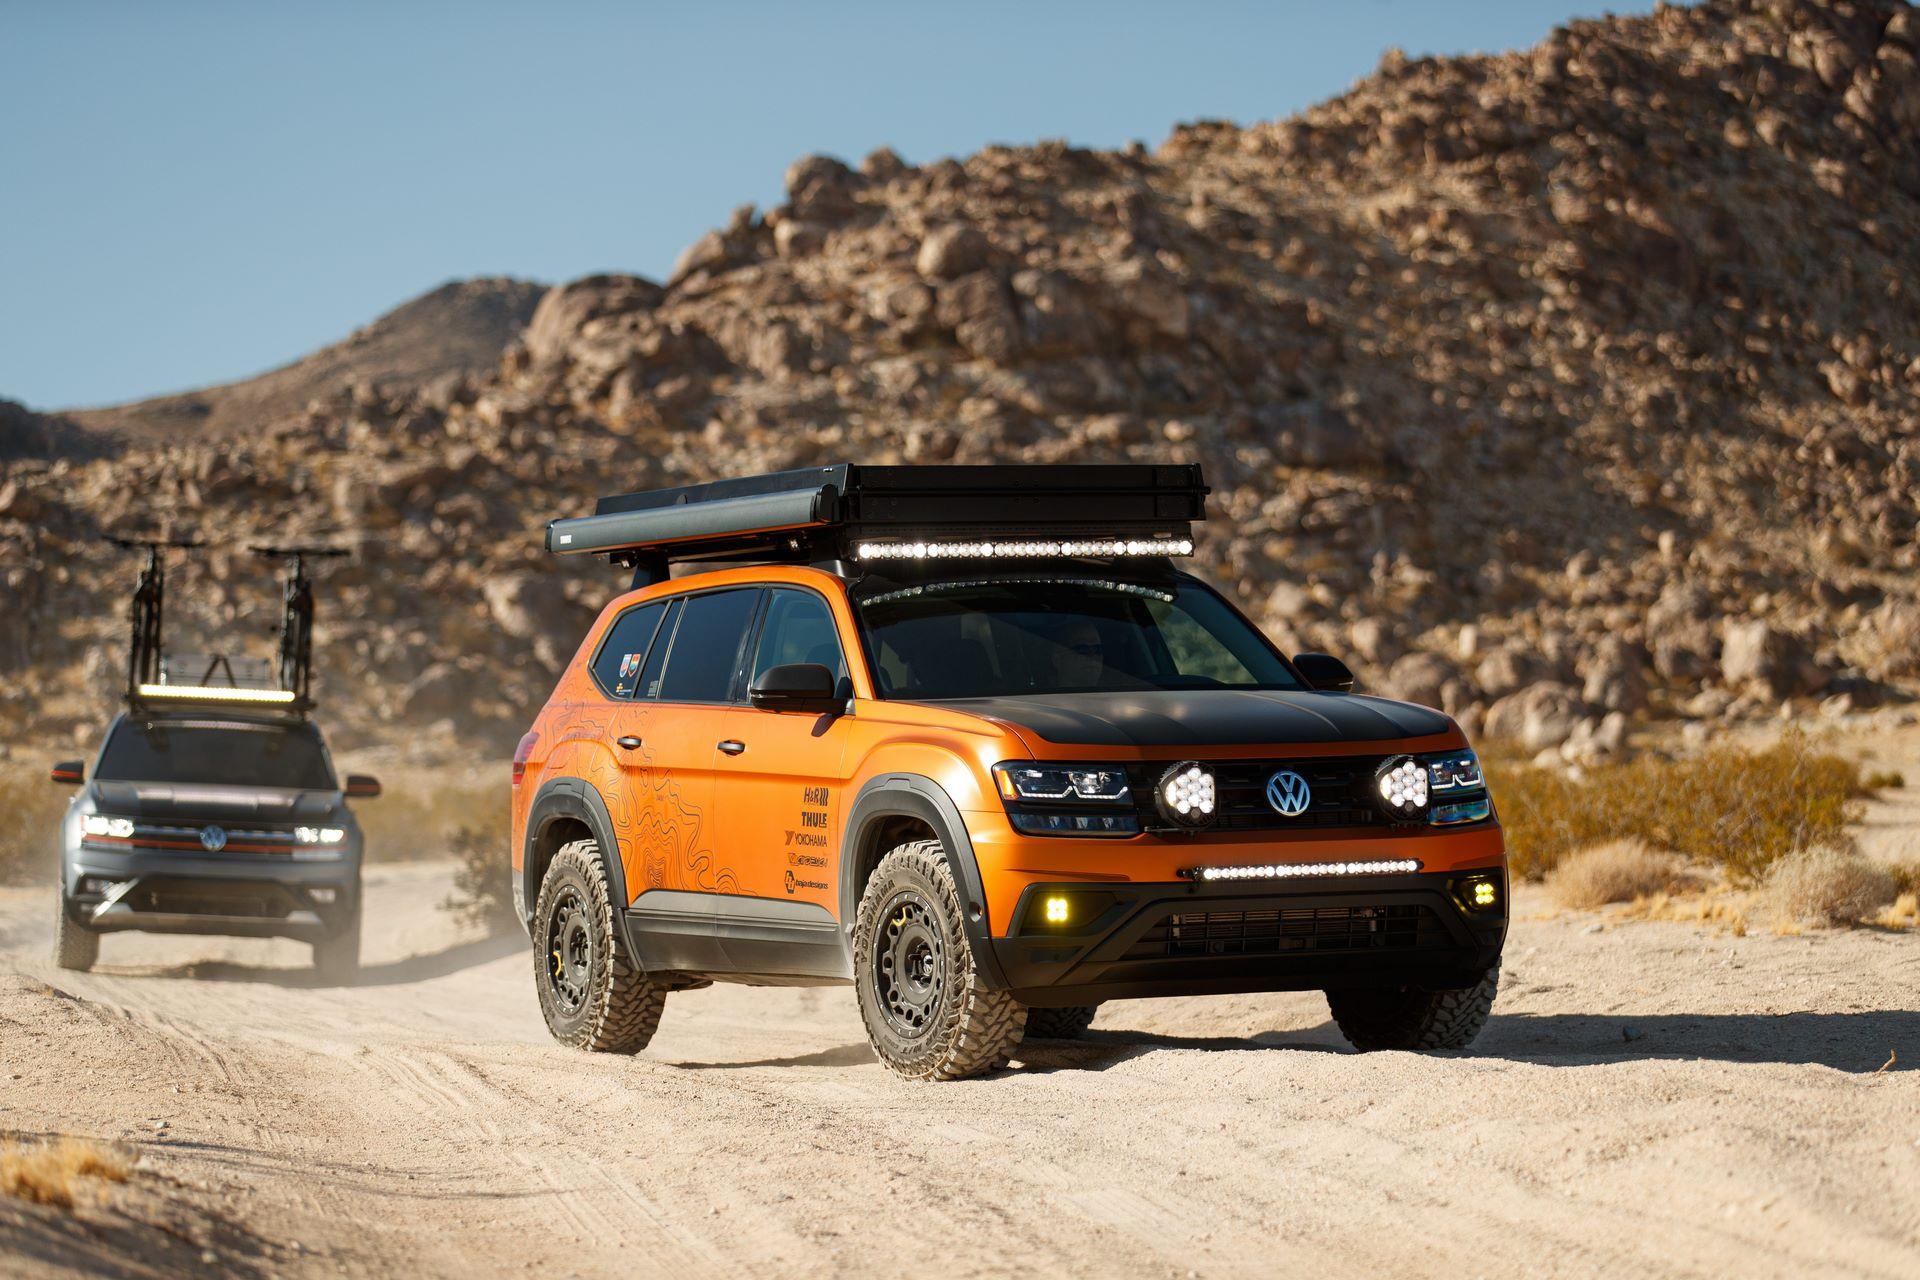 Volkswagen_Atlas_Adventure_Concept_and_Atlas_Basecamp_Concept-10462